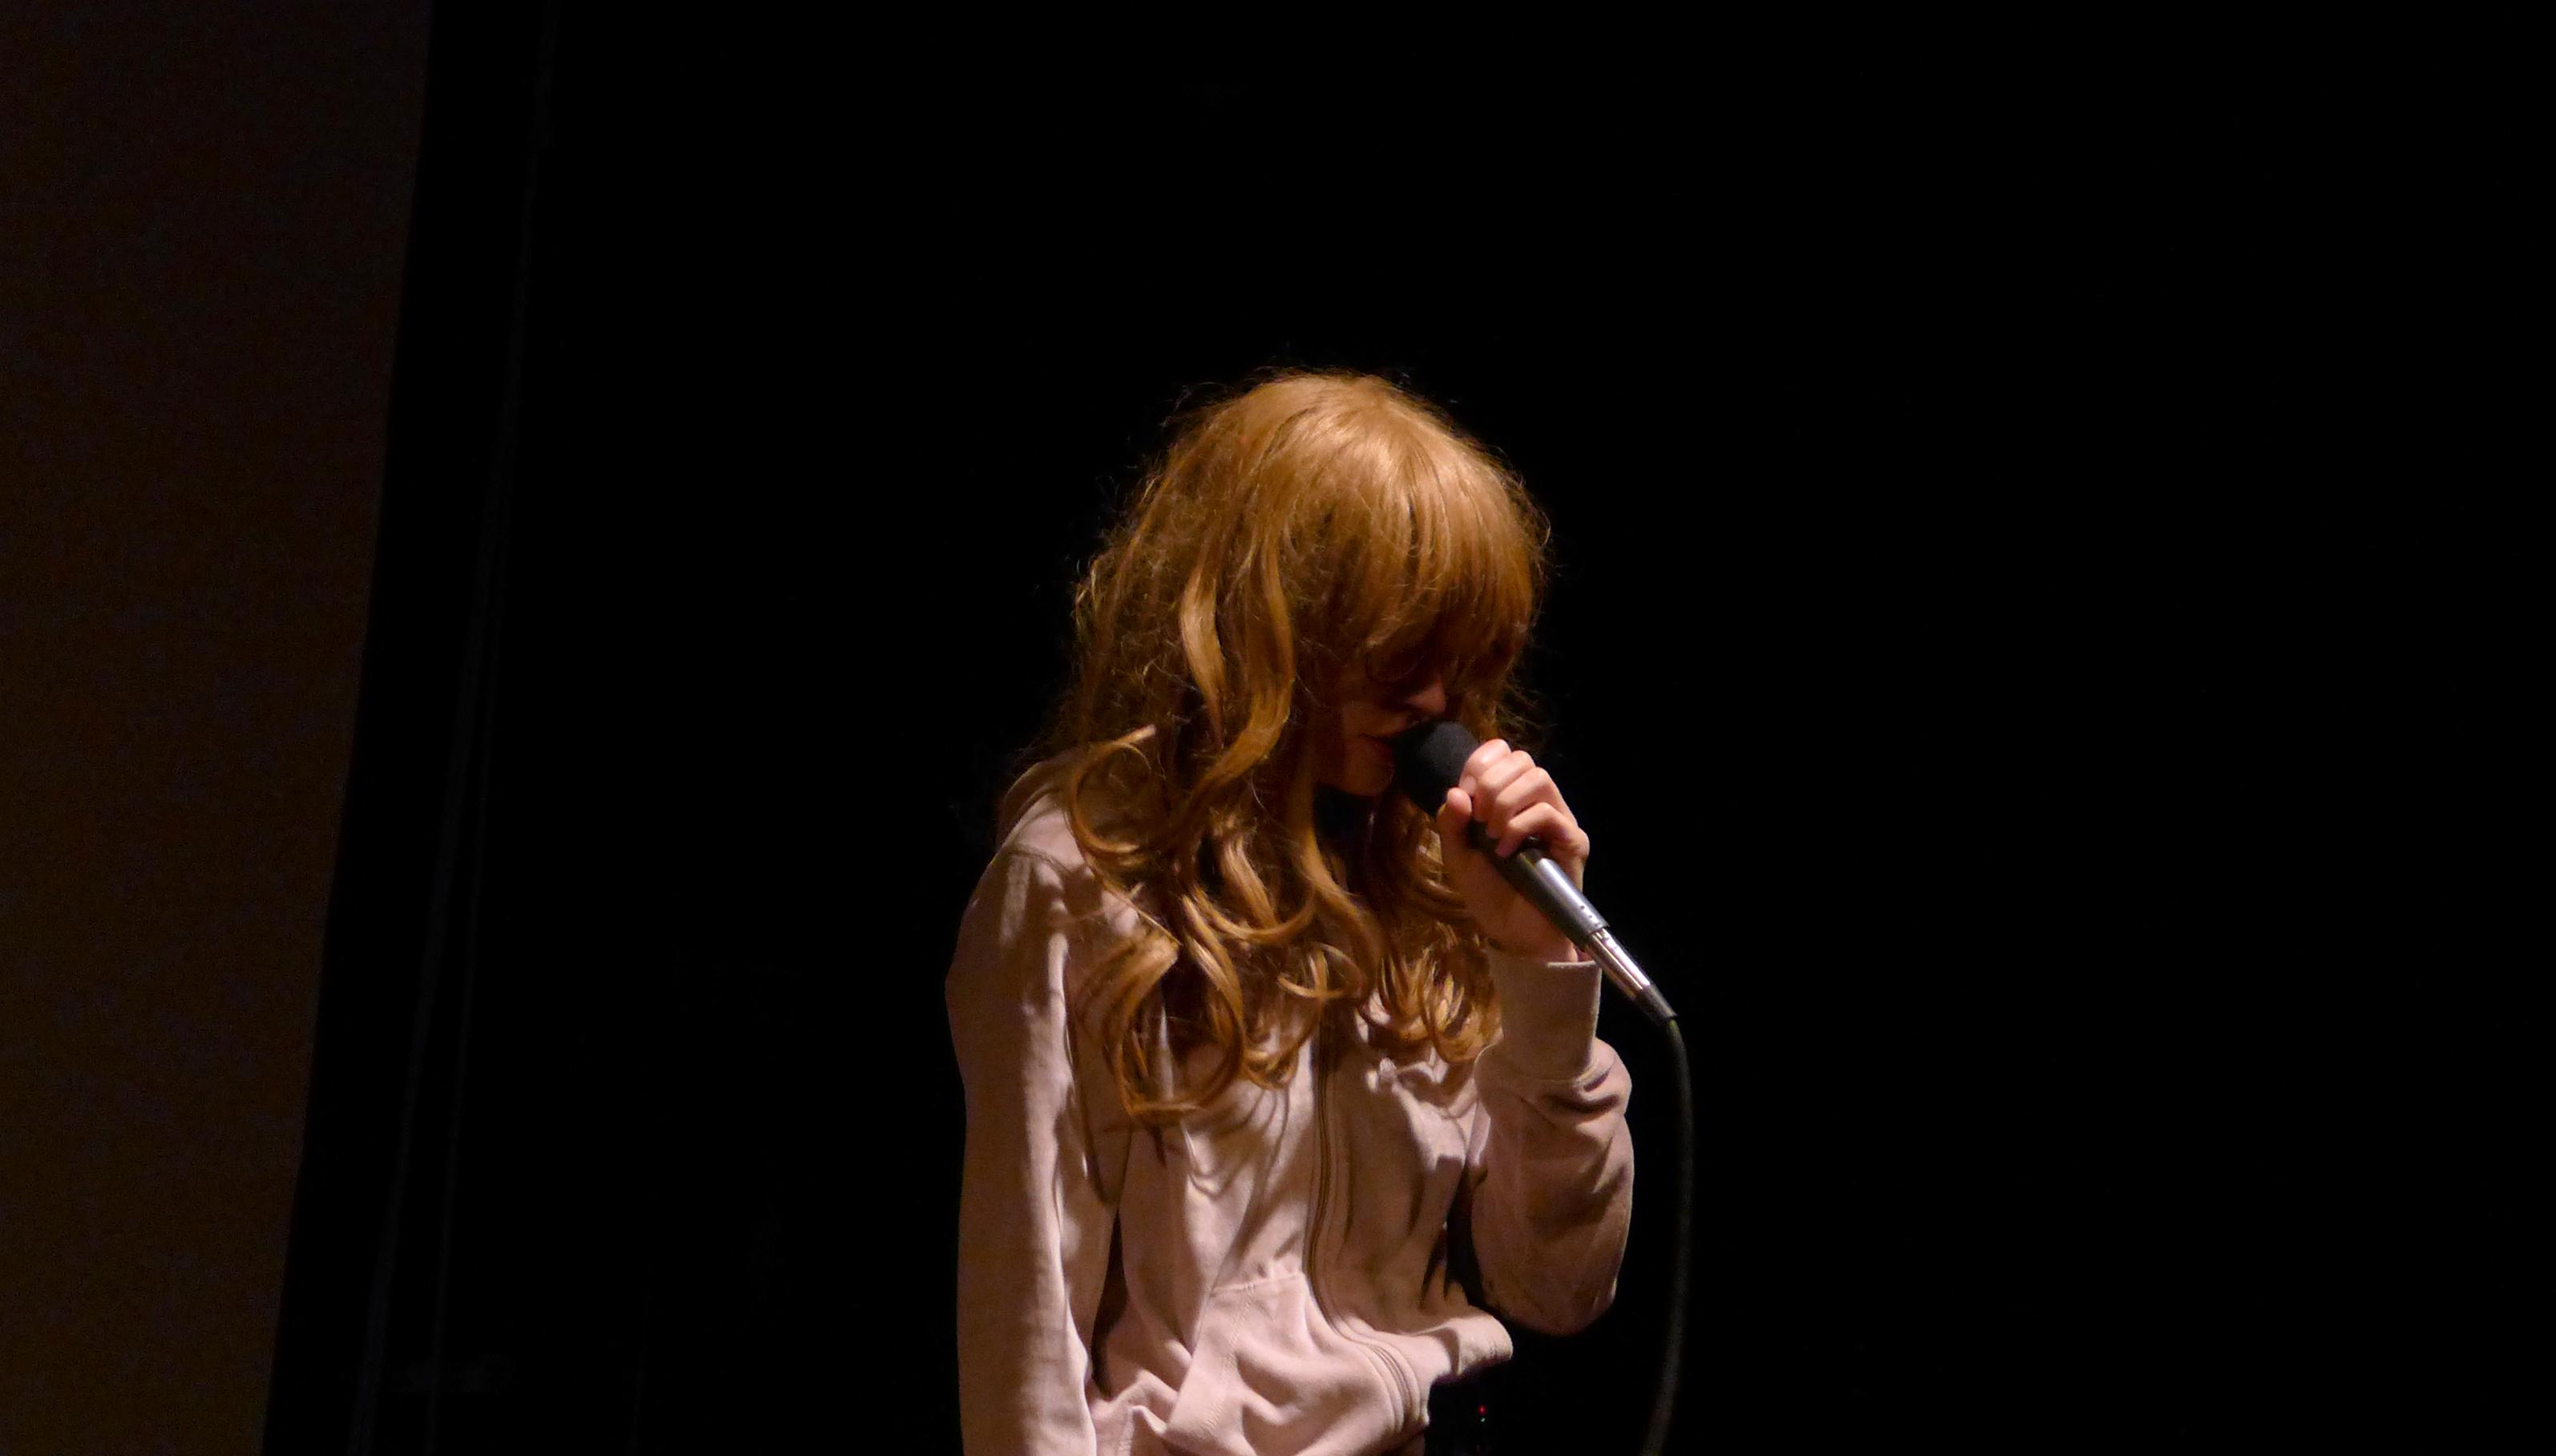 jenny hval1 Live Review: Jenny Hval at Chicagos Constellation (9/3)